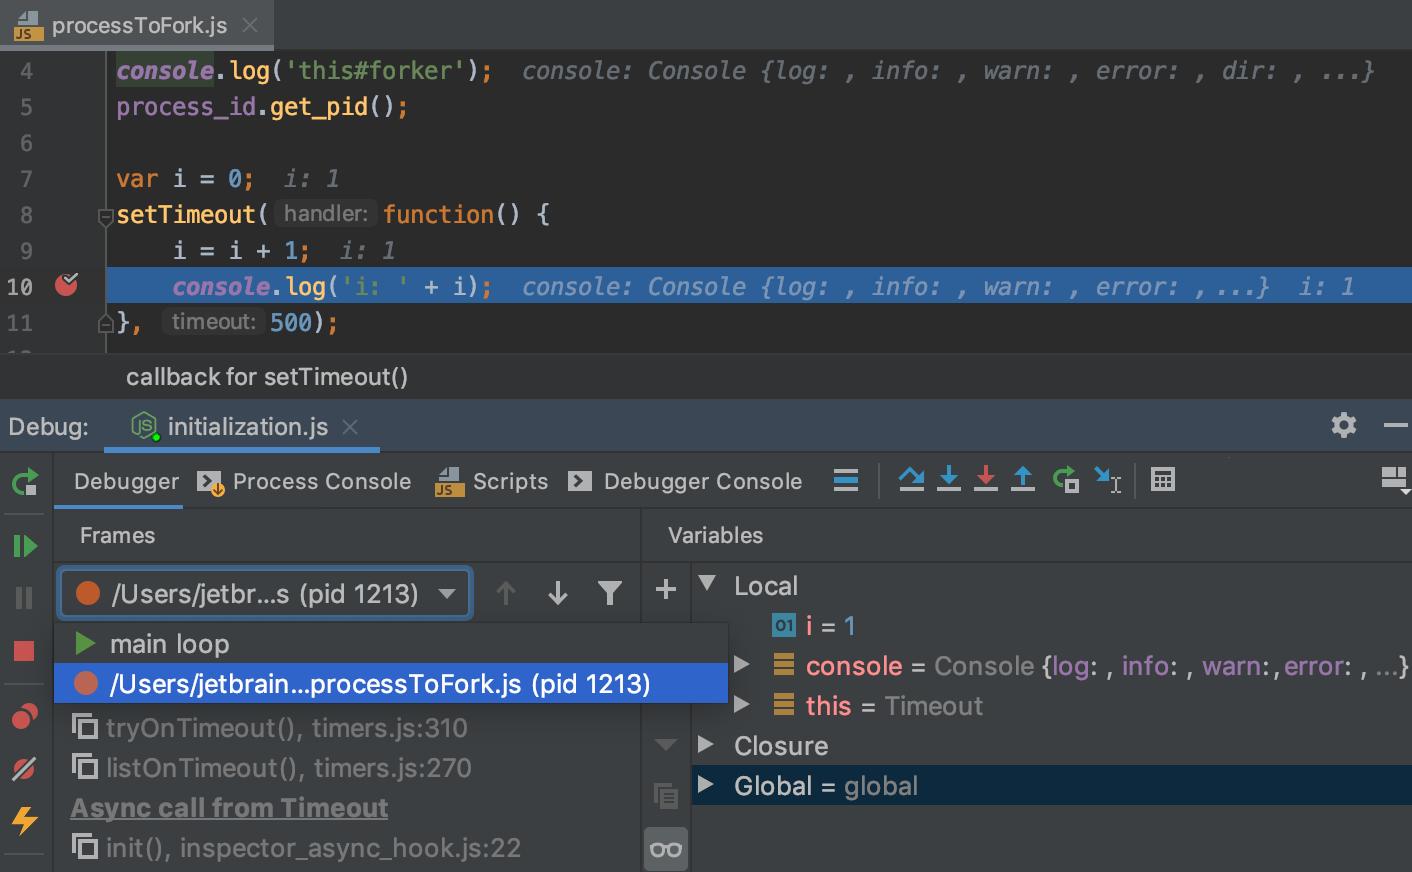 Node.js application: Multi-process debugging